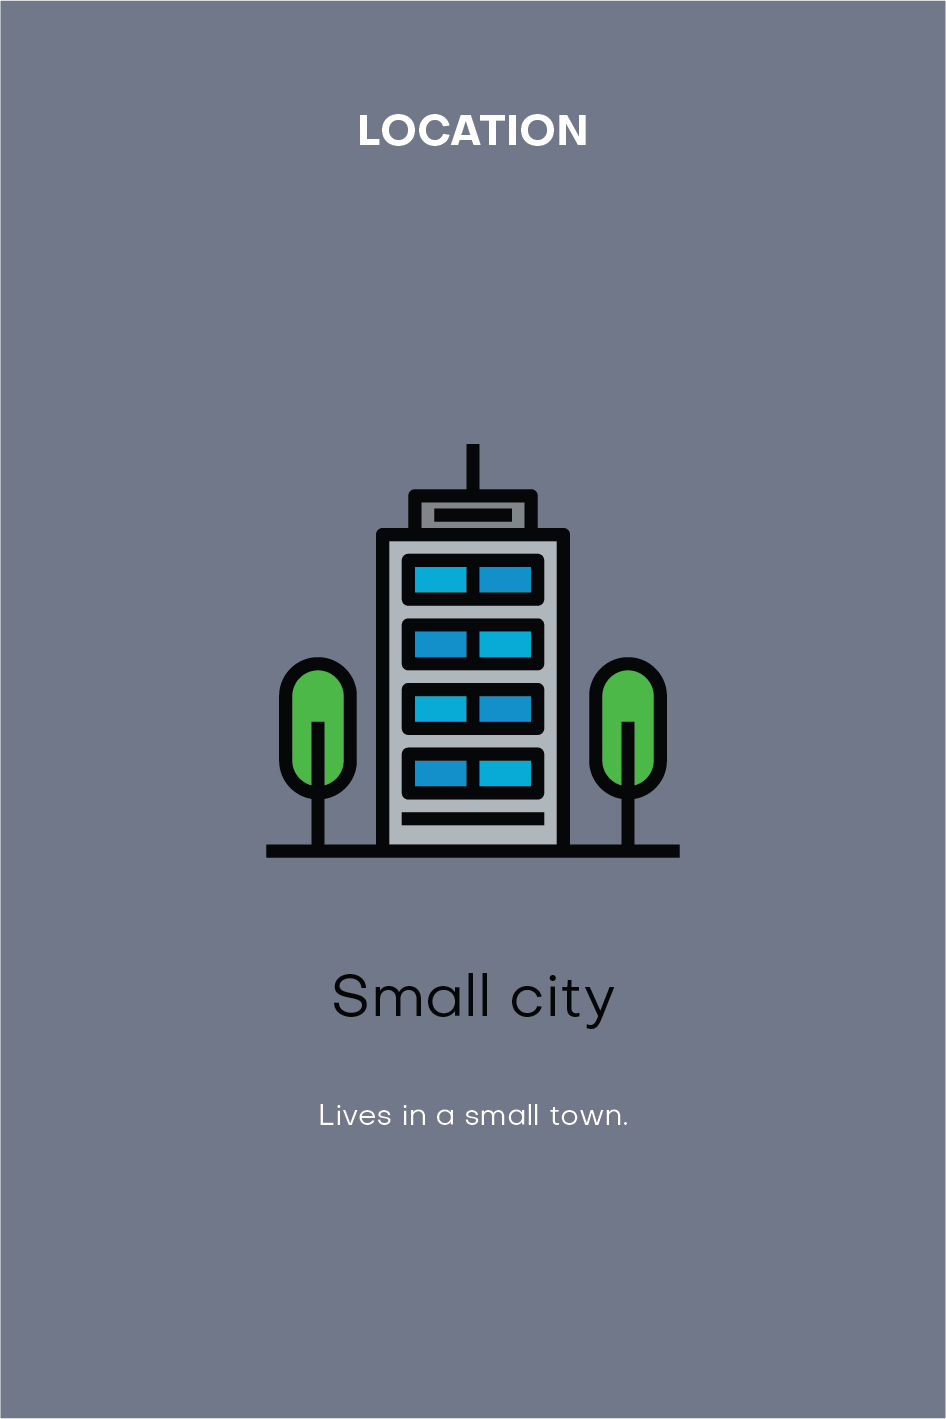 Archetype: Location, Small City